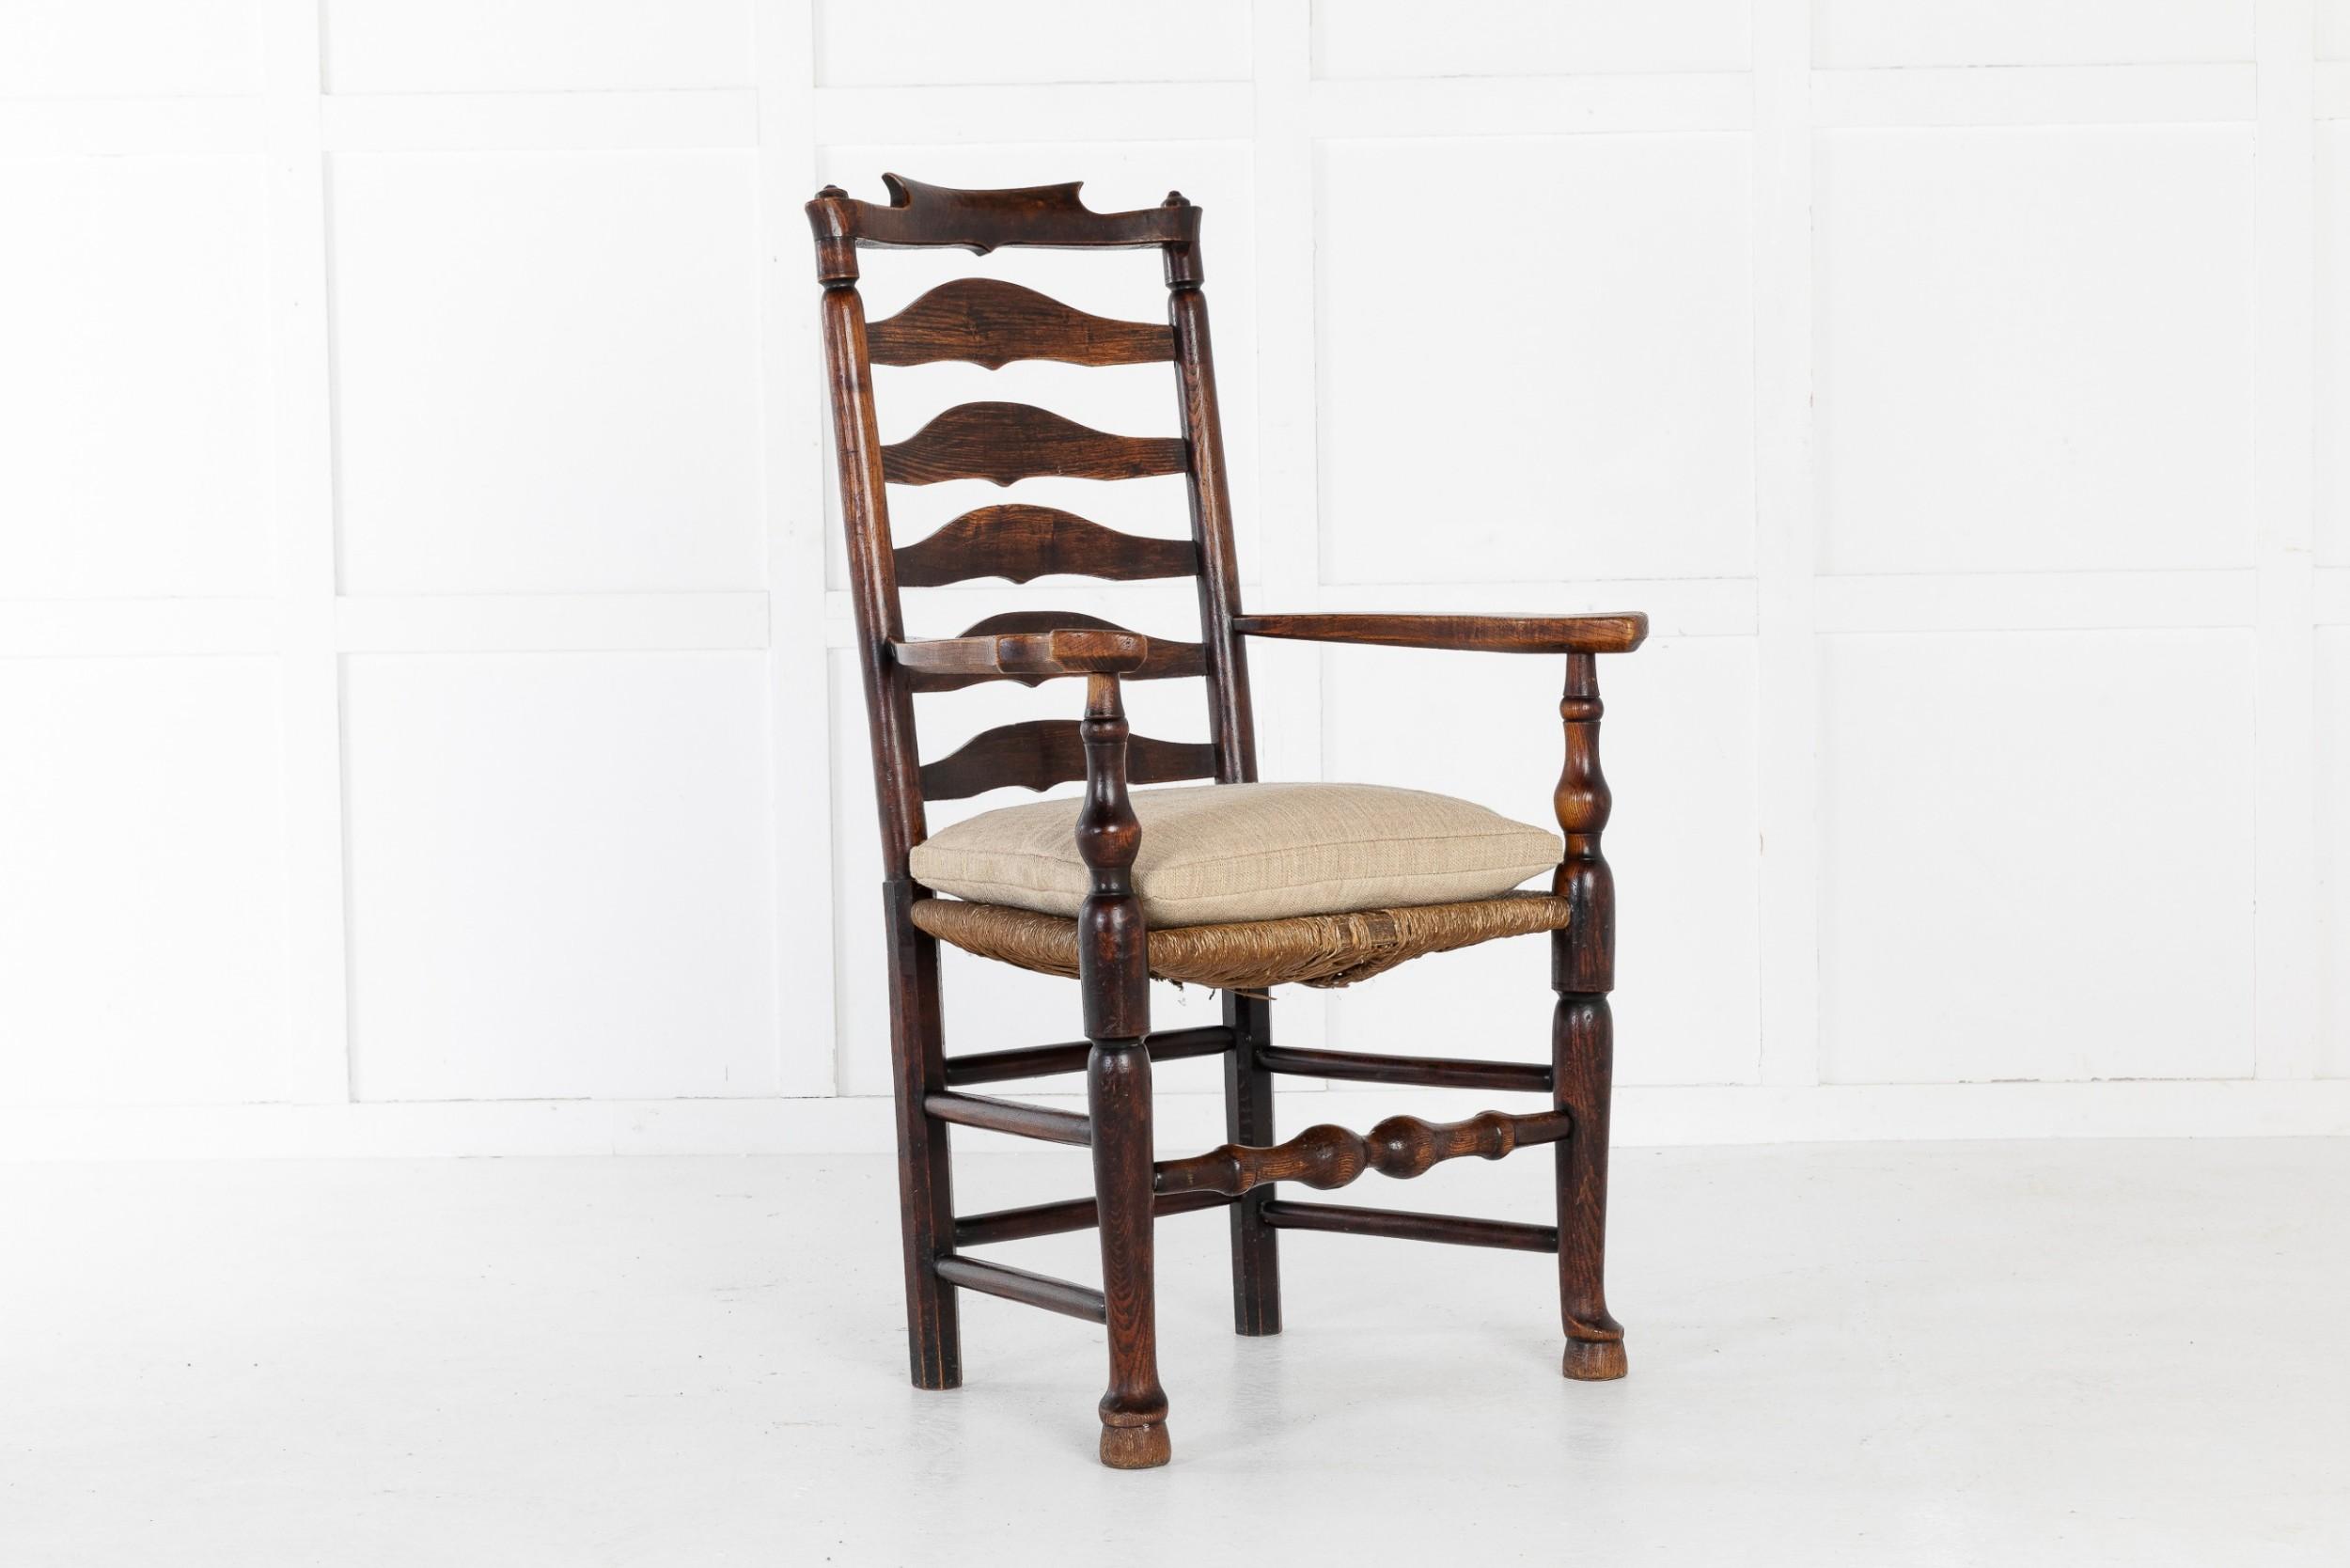 18th century english elm ladderback carver chair